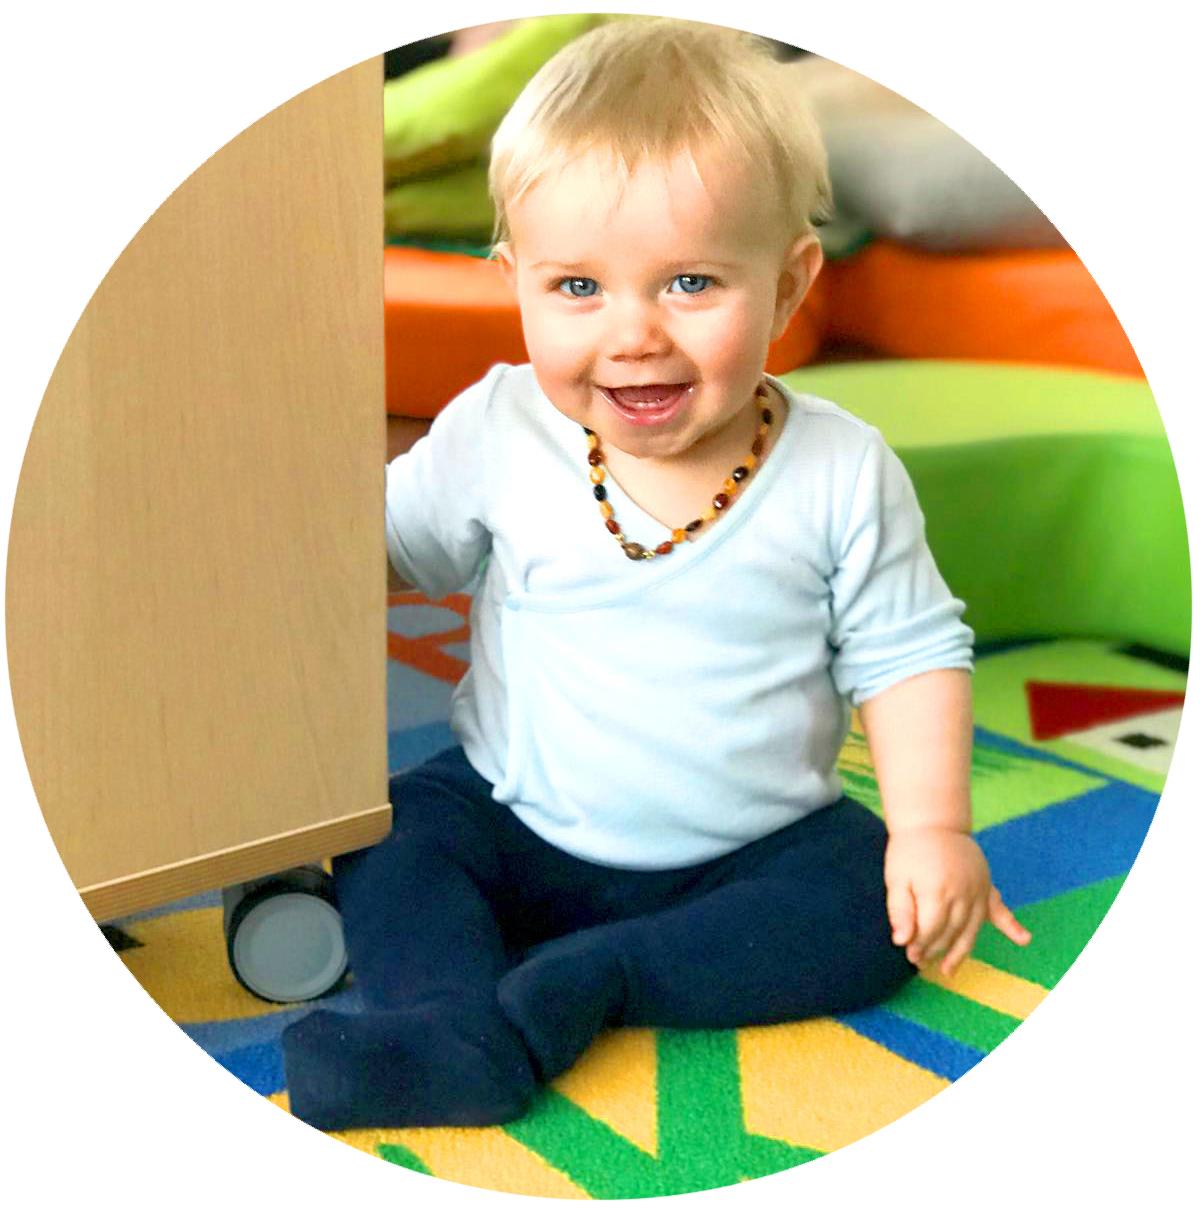 Atemberaubend Baby Schwenkrahmen Im Freien Fotos - Bilderrahmen ...